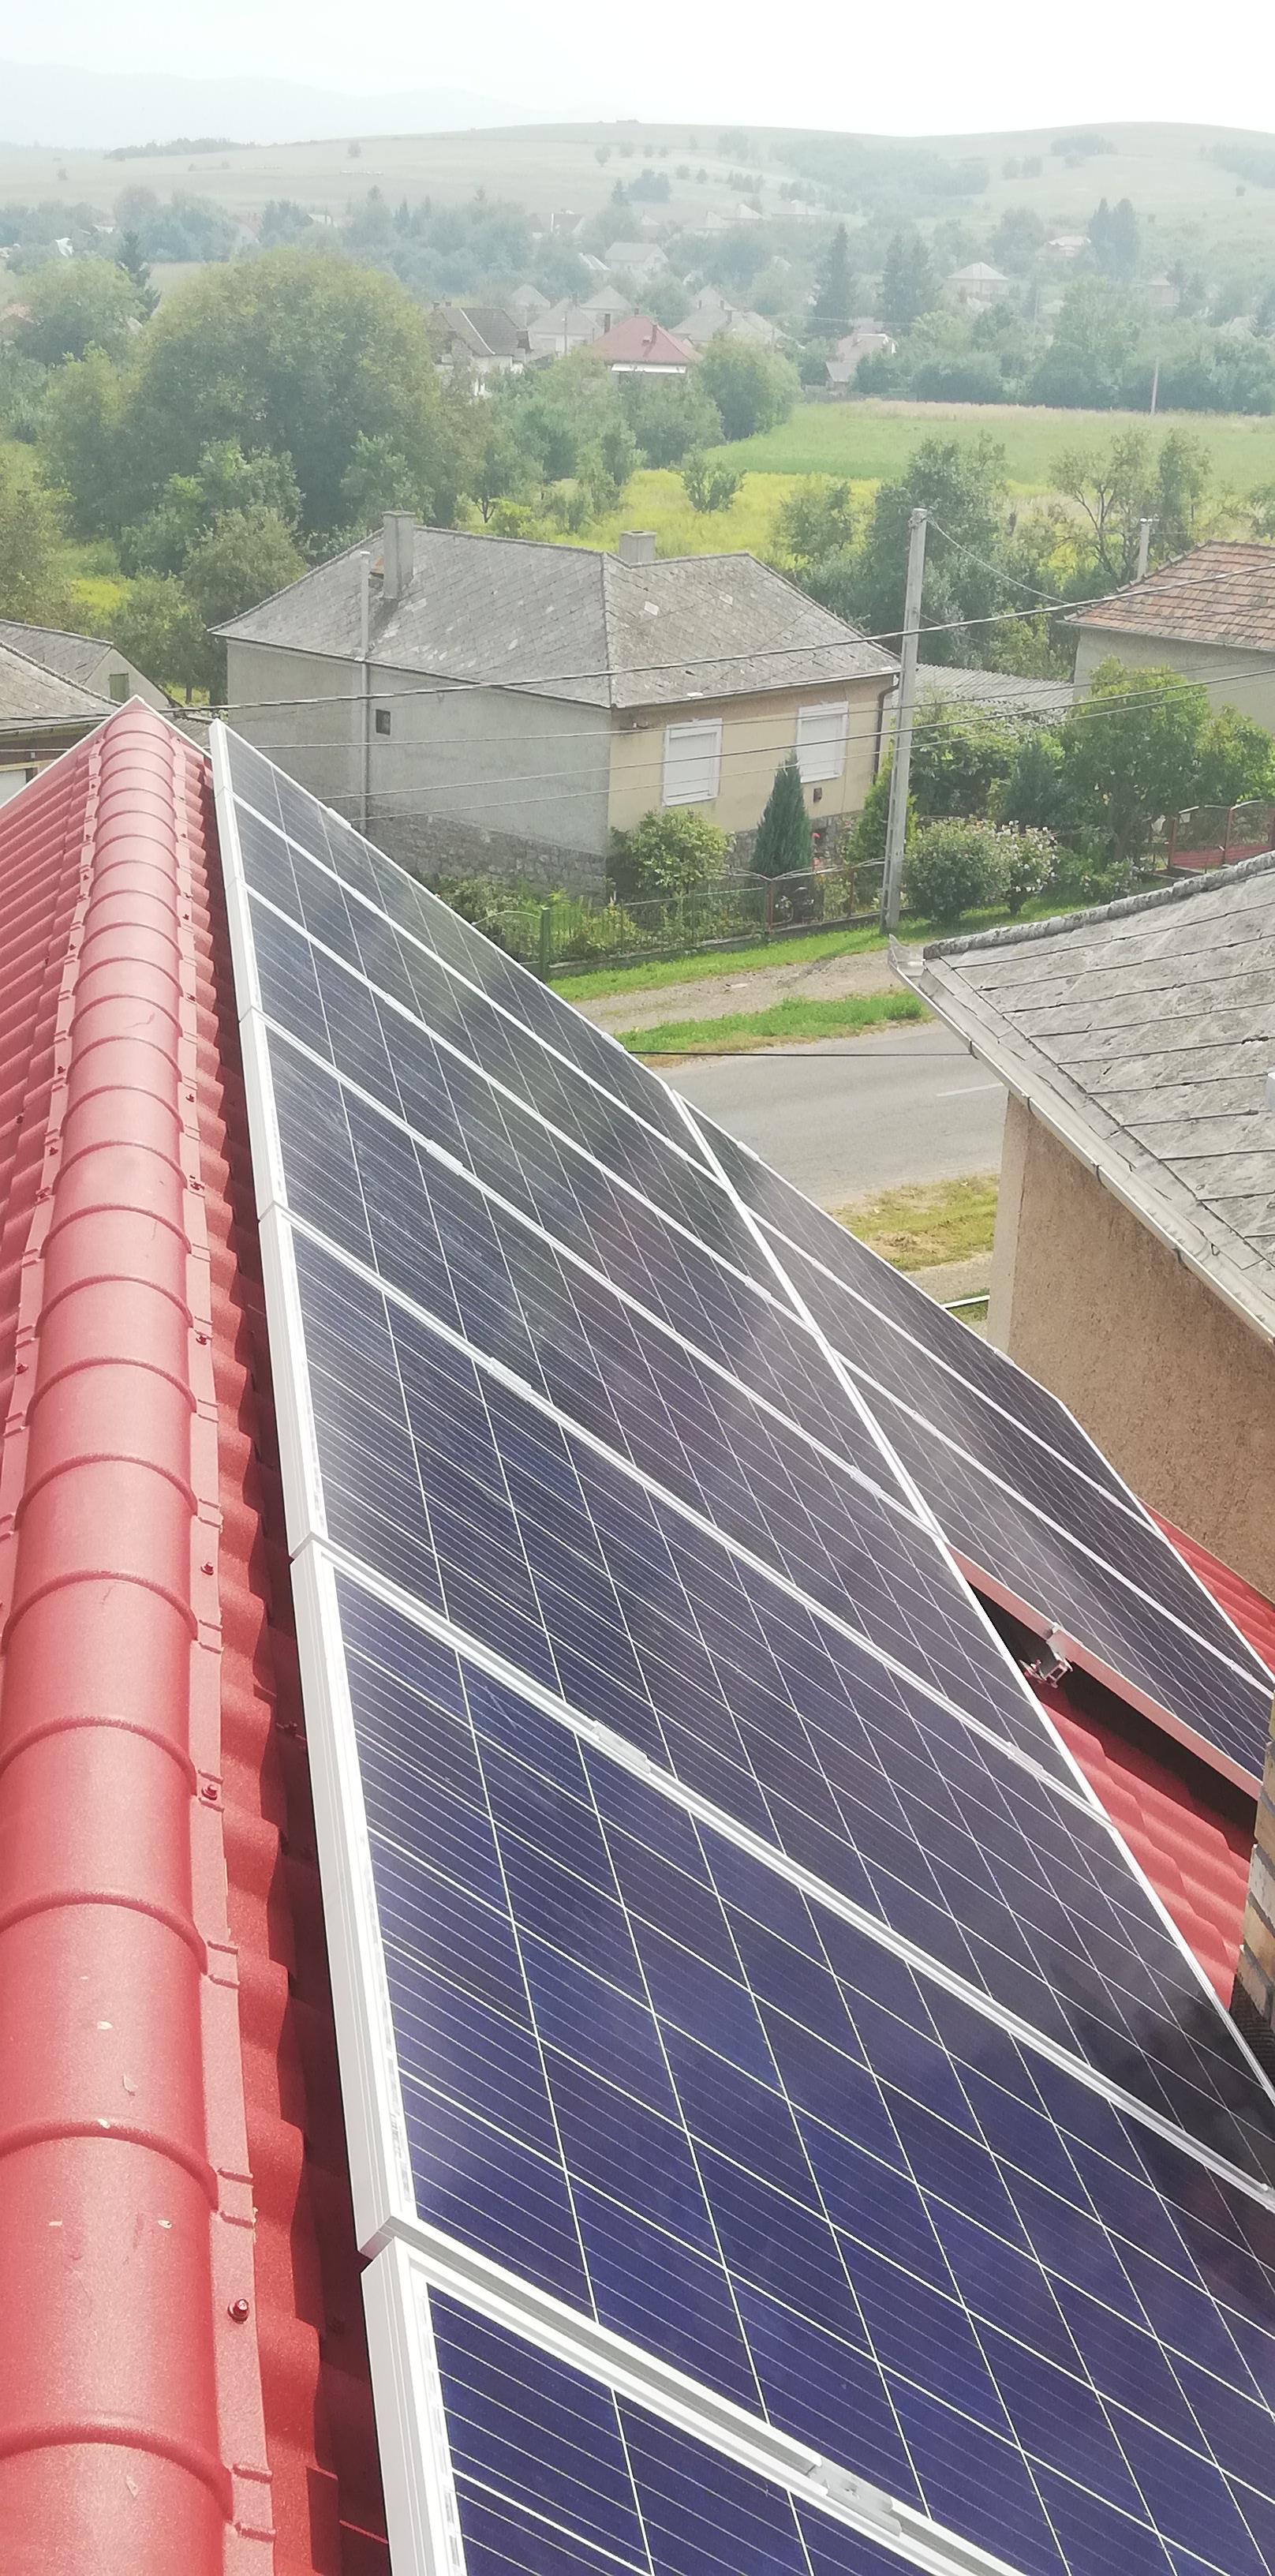 Csernely - 3,025KWP teljesítményű napelemes rendszer